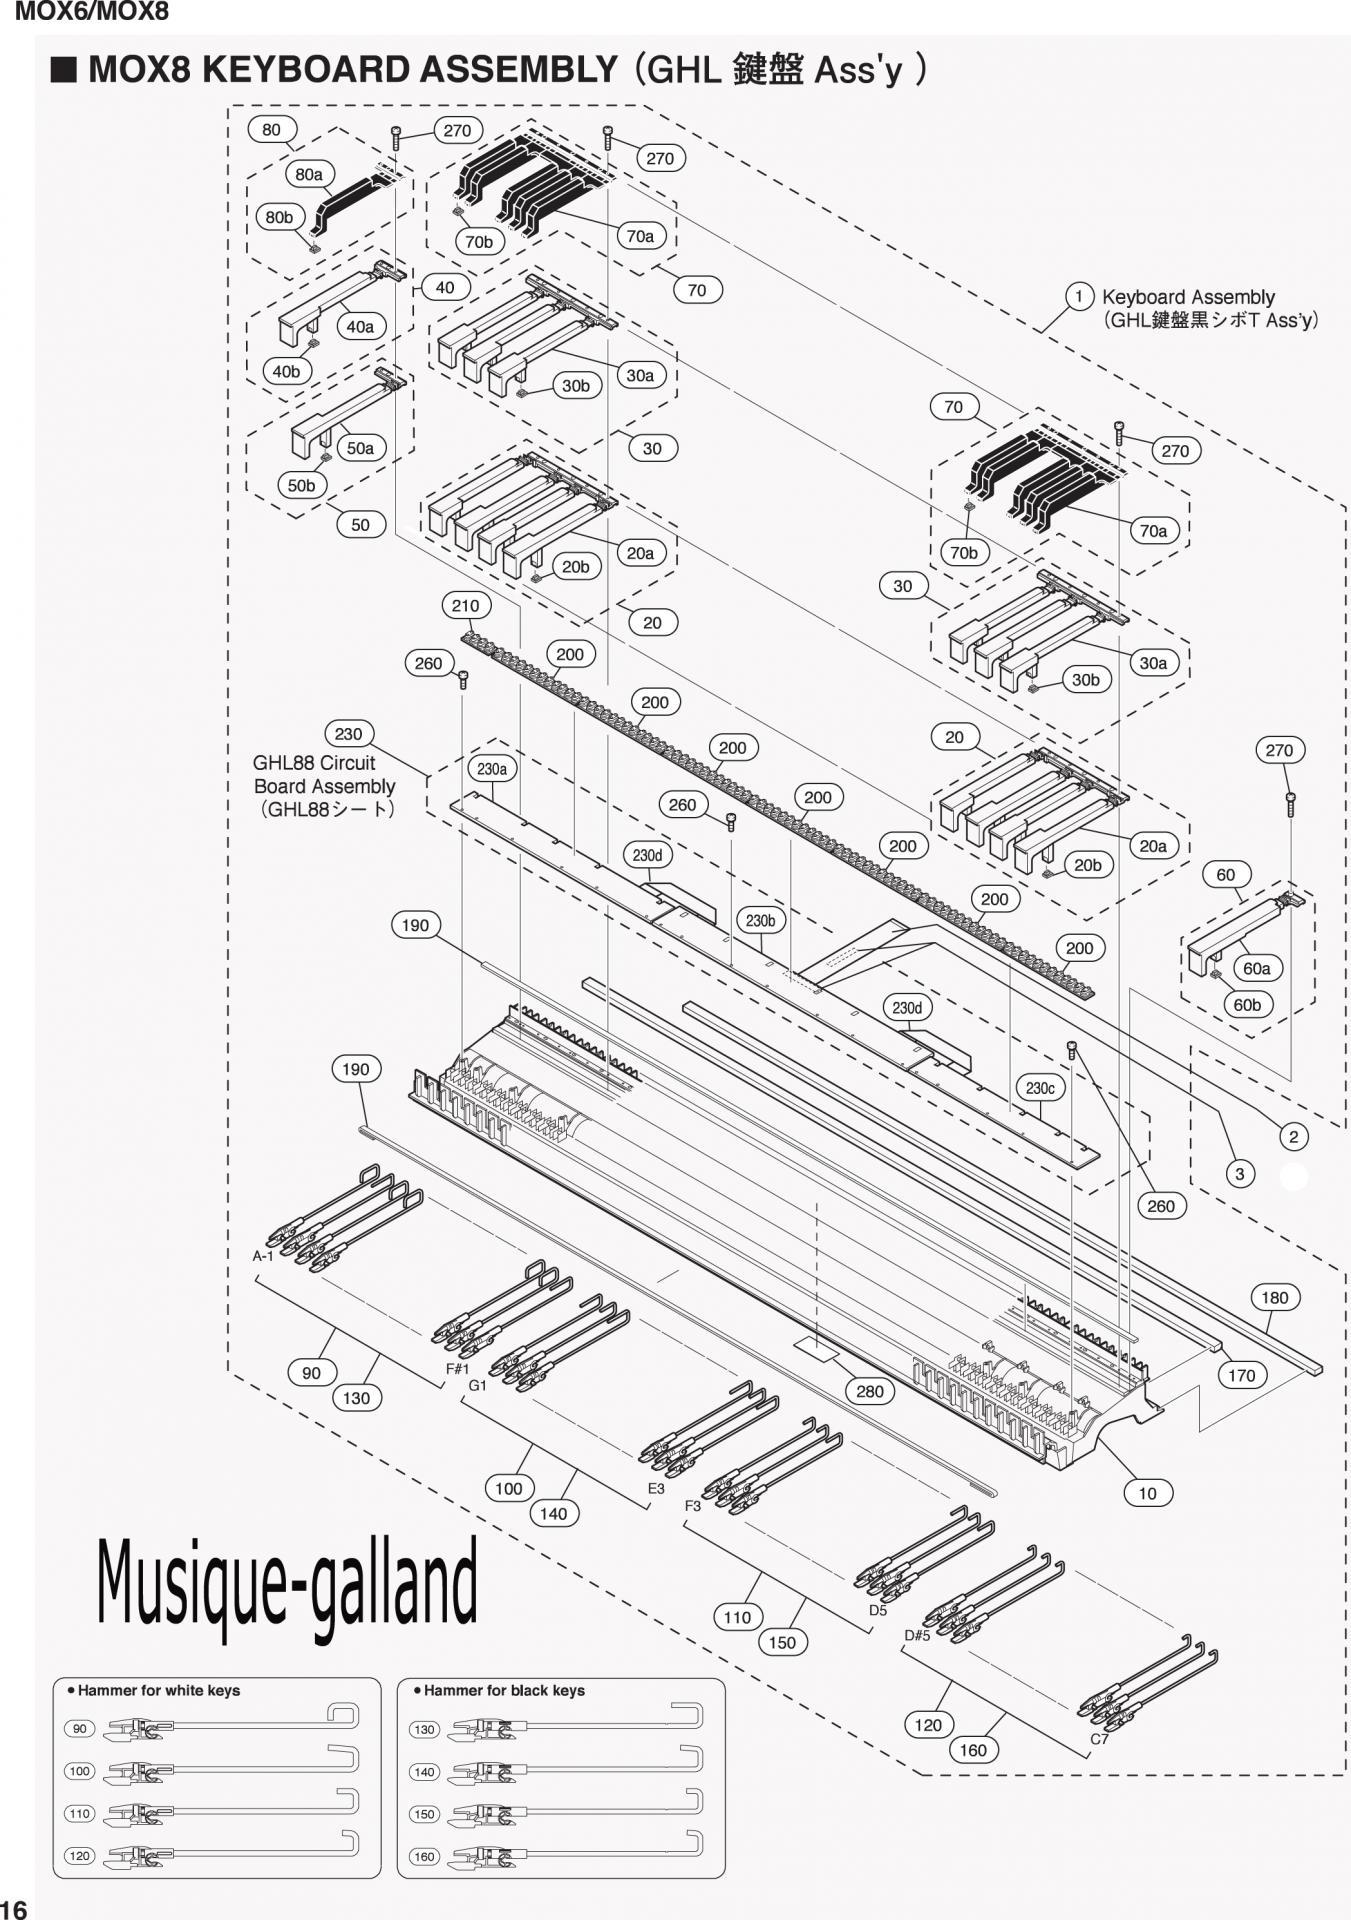 Mox 8 clavier